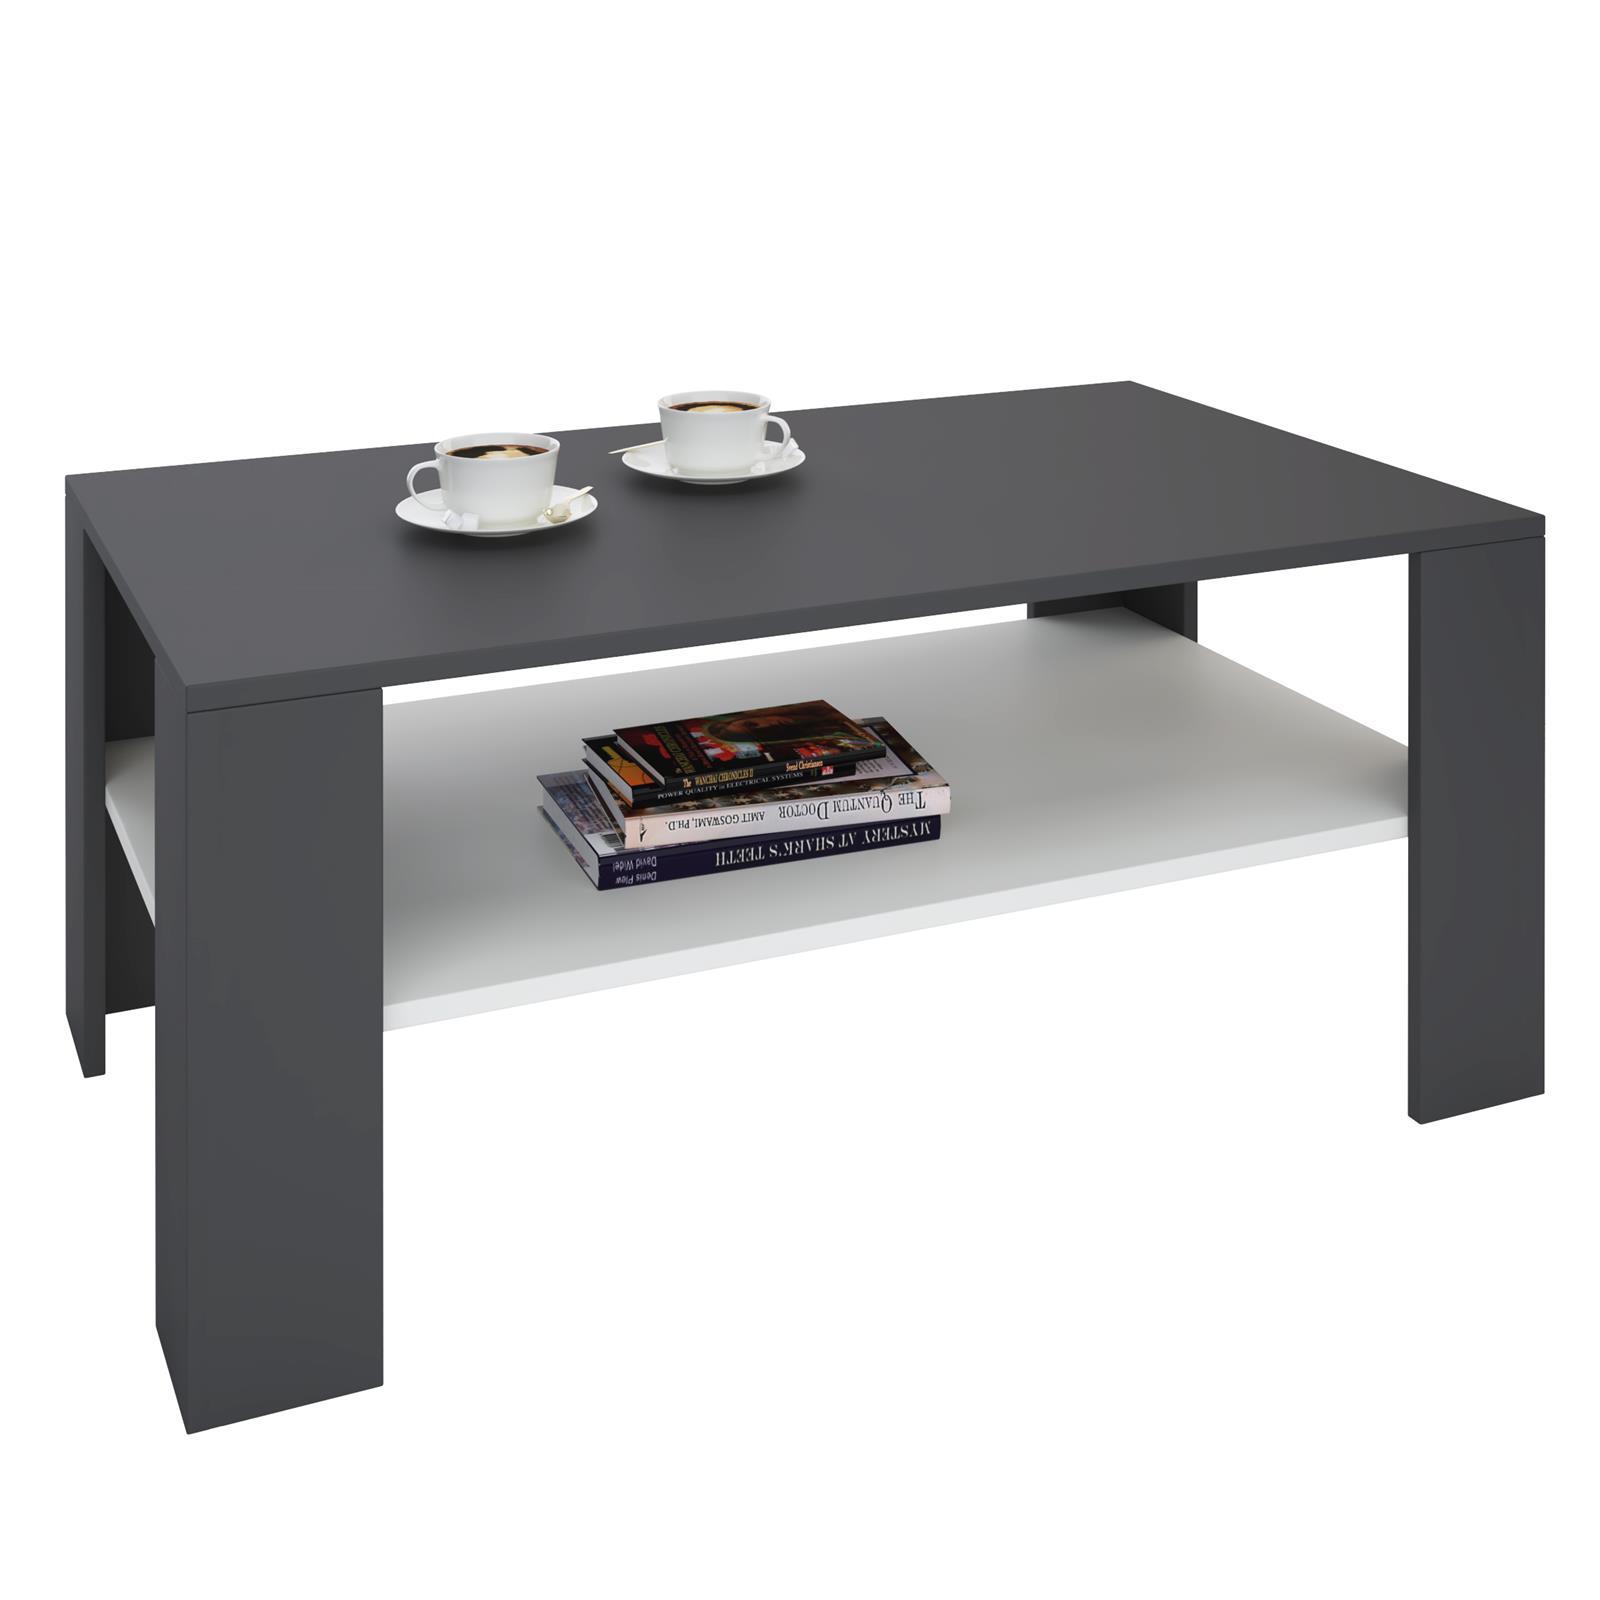 couchtisch animo in grau wei 100 x 60 cm caro m bel. Black Bedroom Furniture Sets. Home Design Ideas